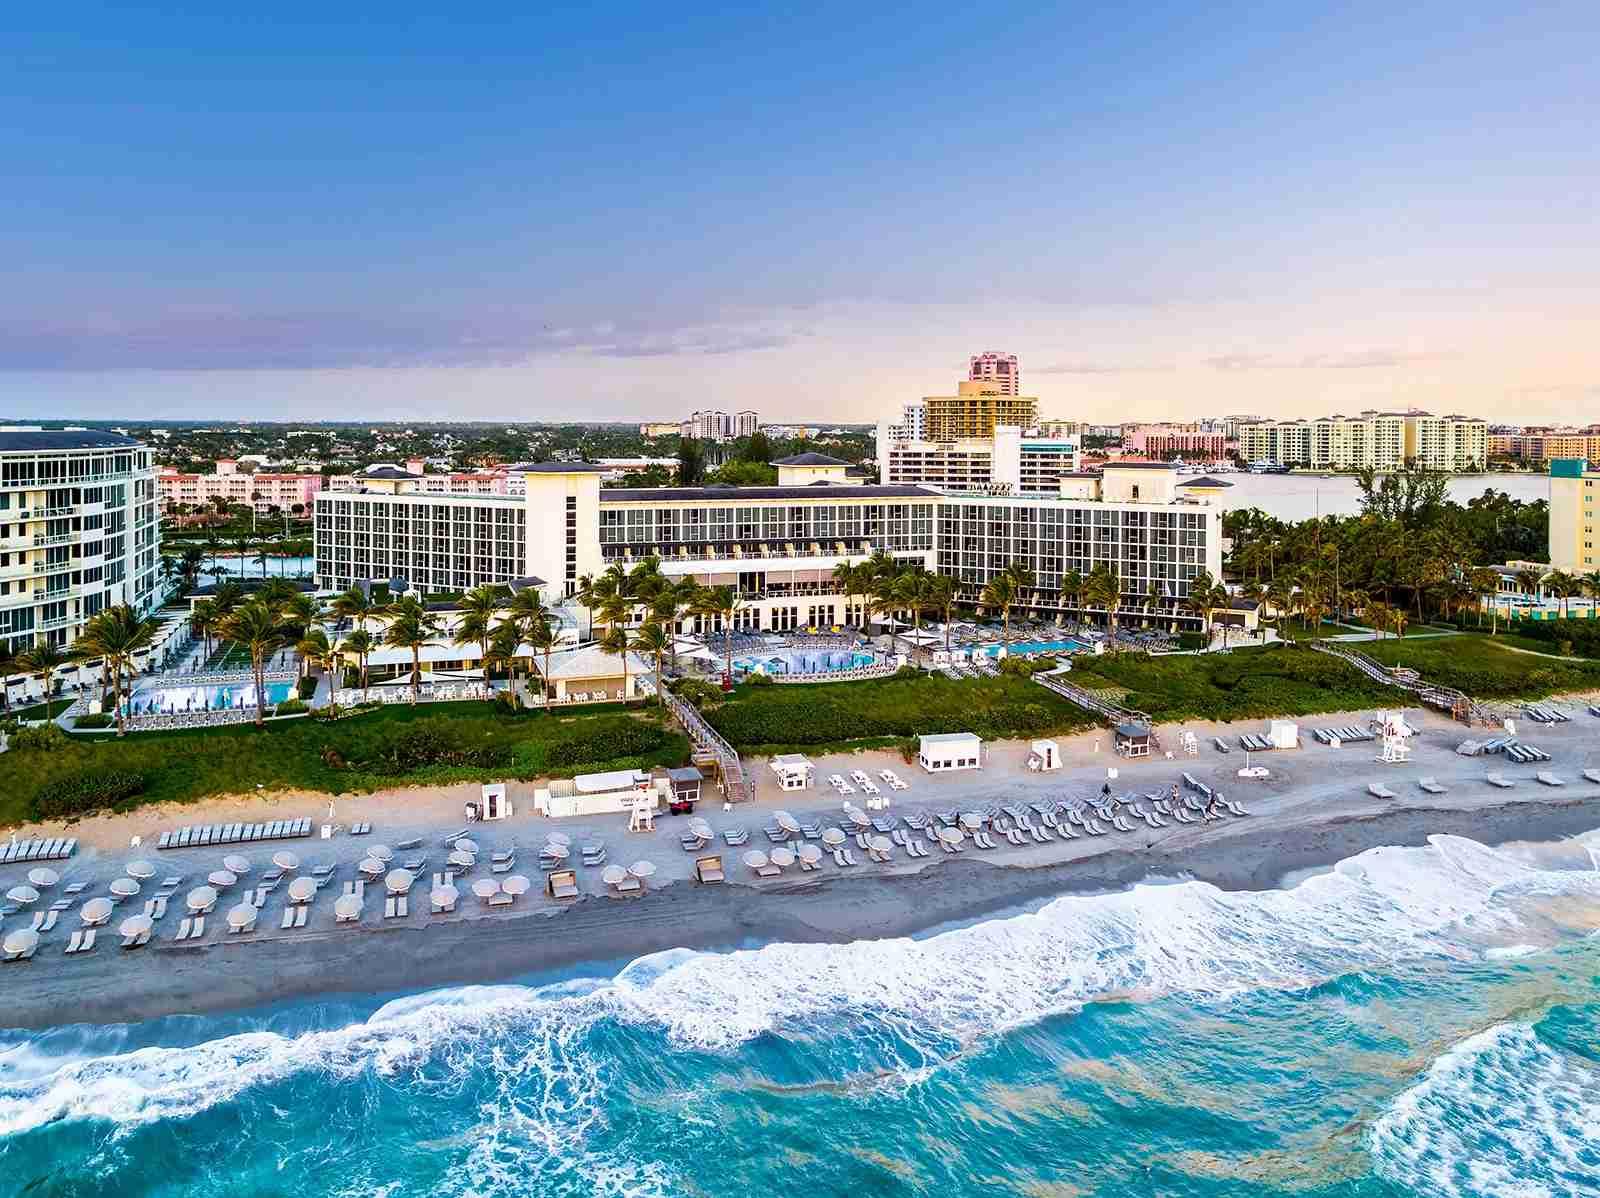 Boca Raton Resort & Club, A Waldorf Astoria Resort - Florida